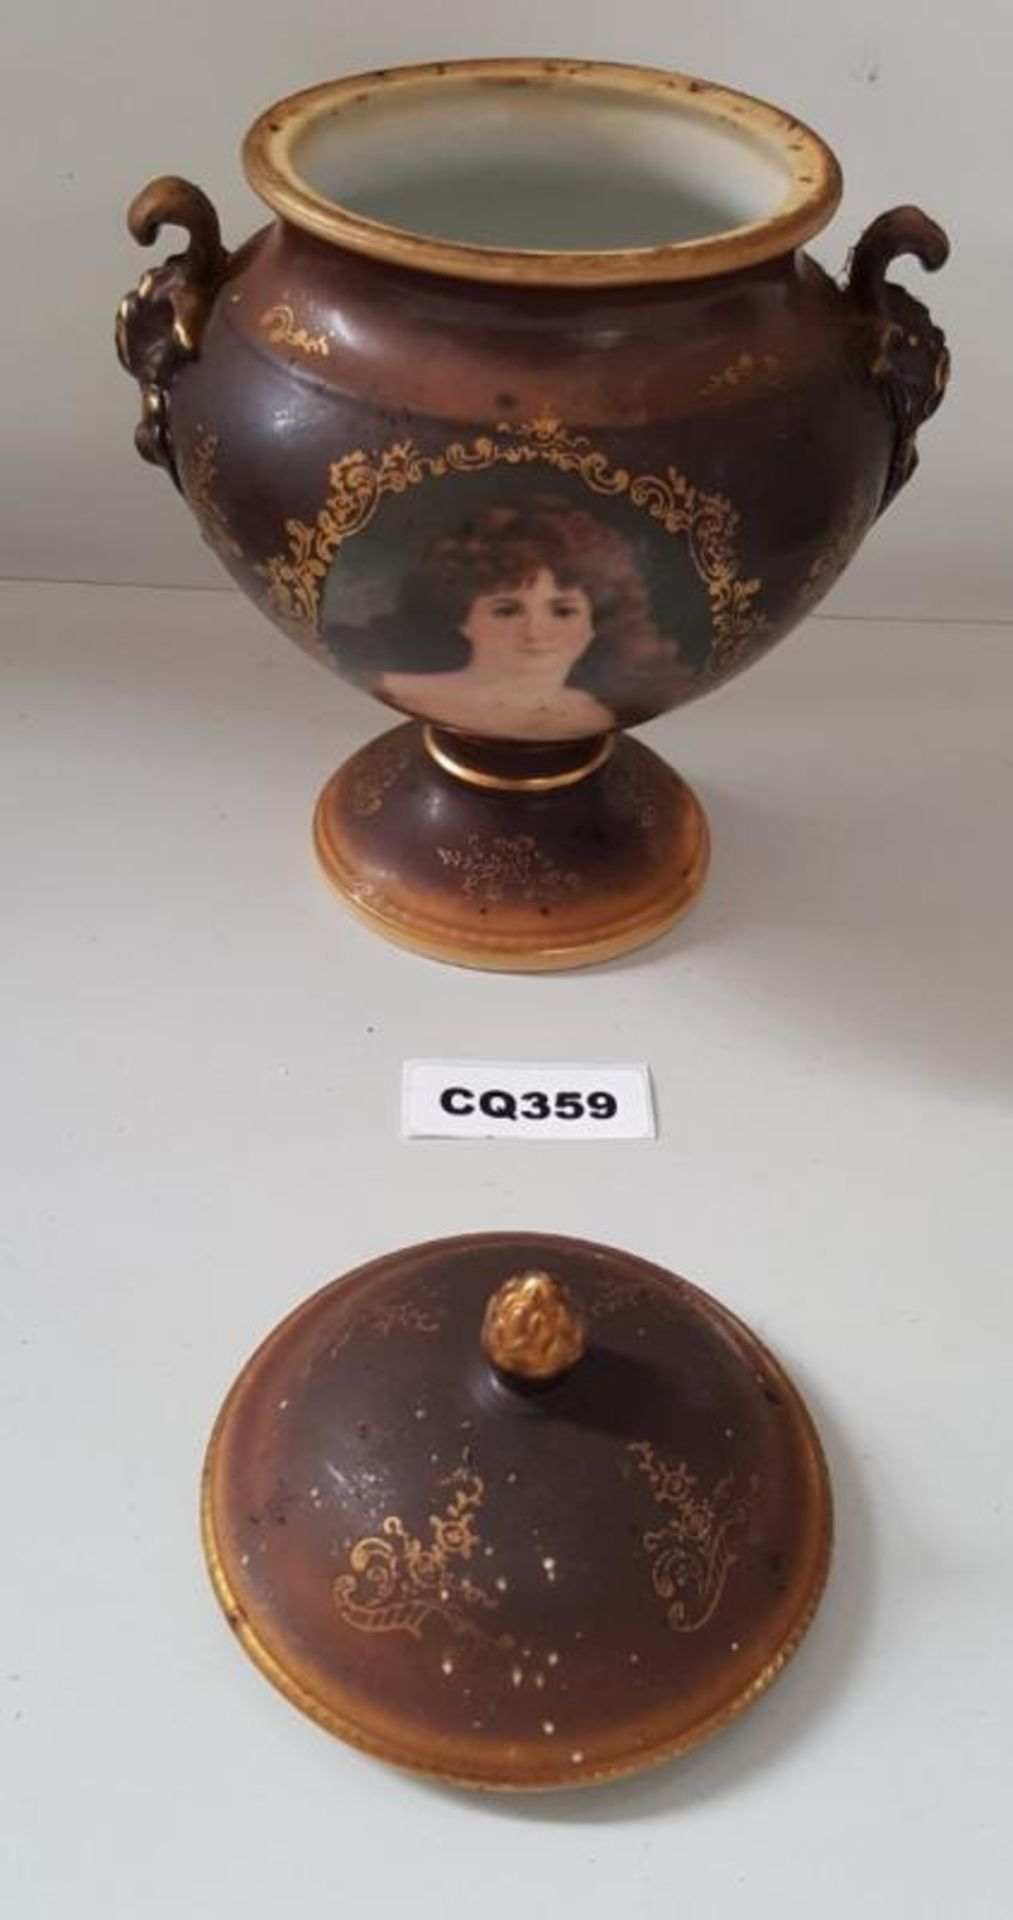 Lot 7346 - 1 x Antique Porcelain Urn With A Womens Portrate On Front - Ref CQ359 E - Dimensions: H21/L15cm - CL